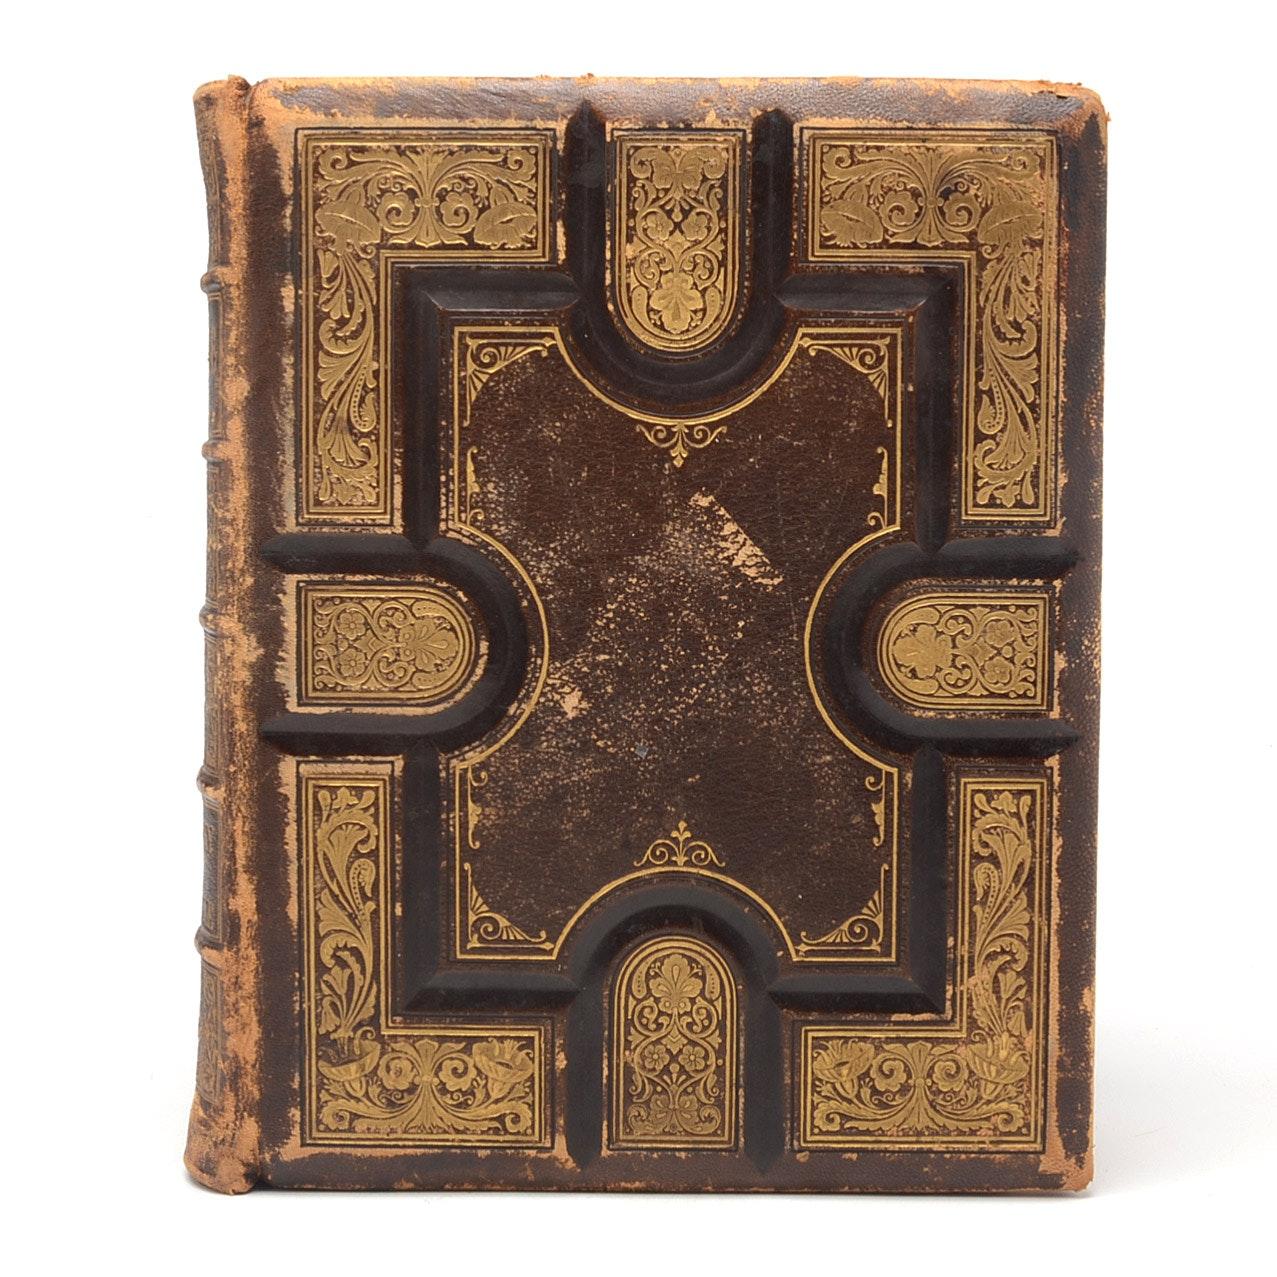 Antique Family Bible